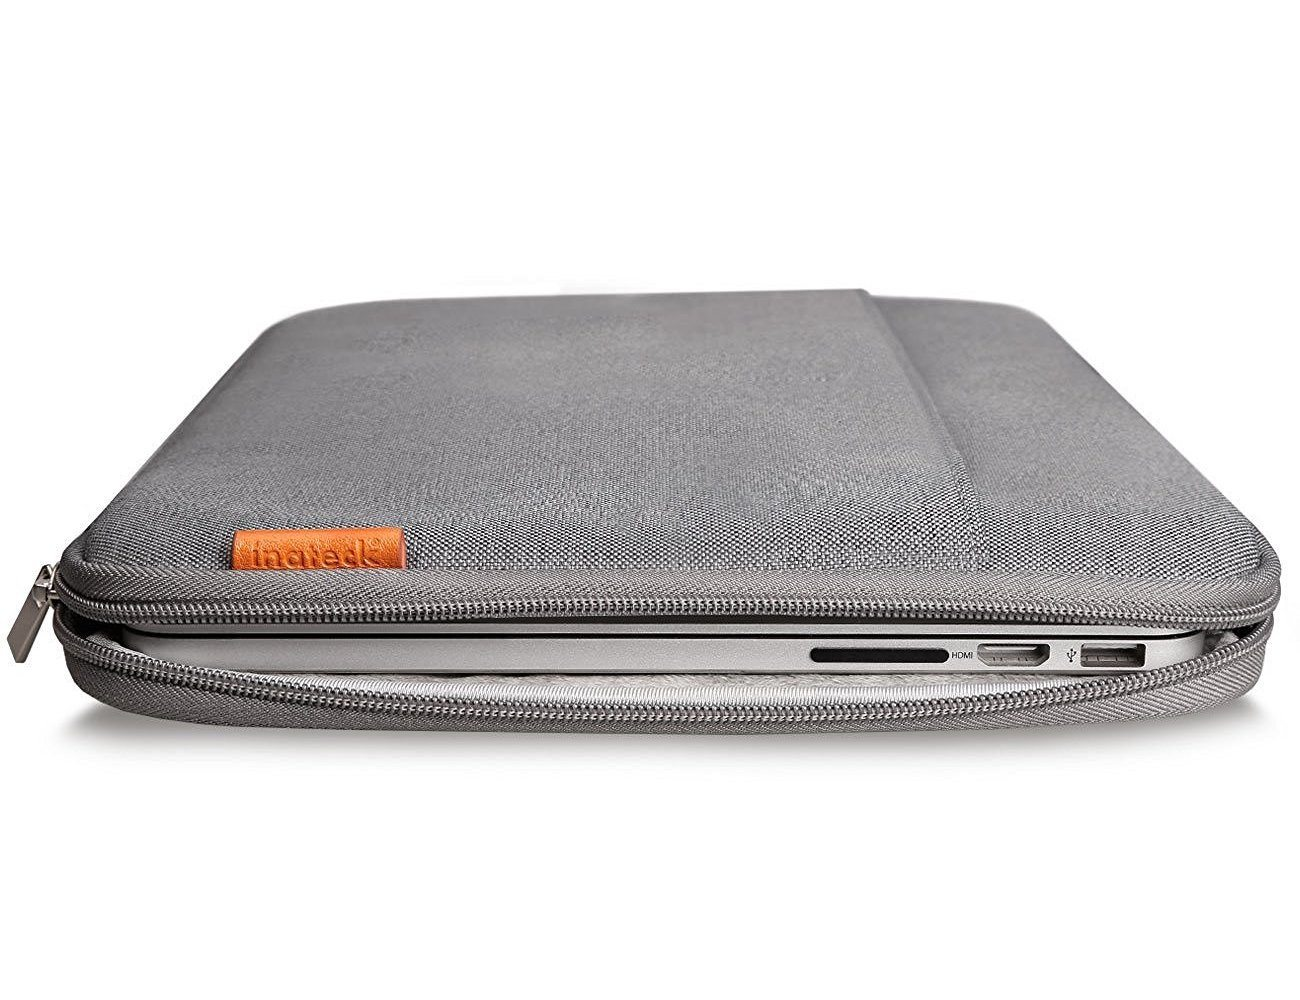 Inateck MacBook Protector Sleeve